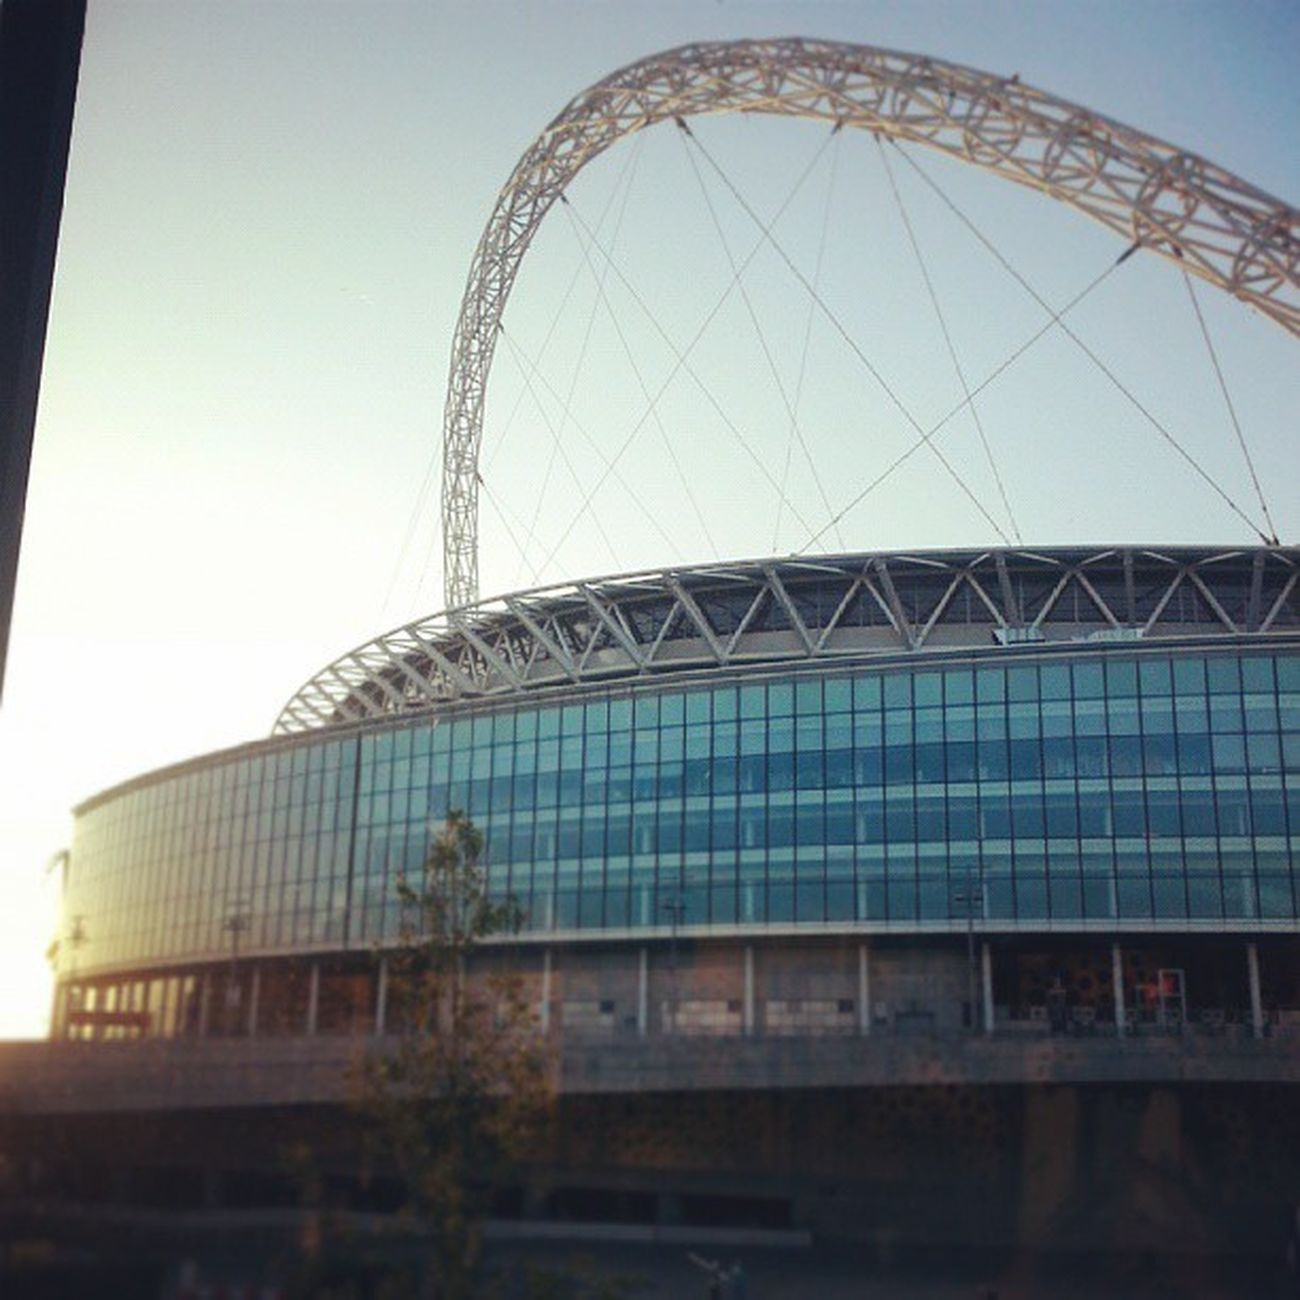 This mornings view at breakfast Wembley Wembleystadium Hilton Hiltonhotel goodmorning sunrise brightandearly newday